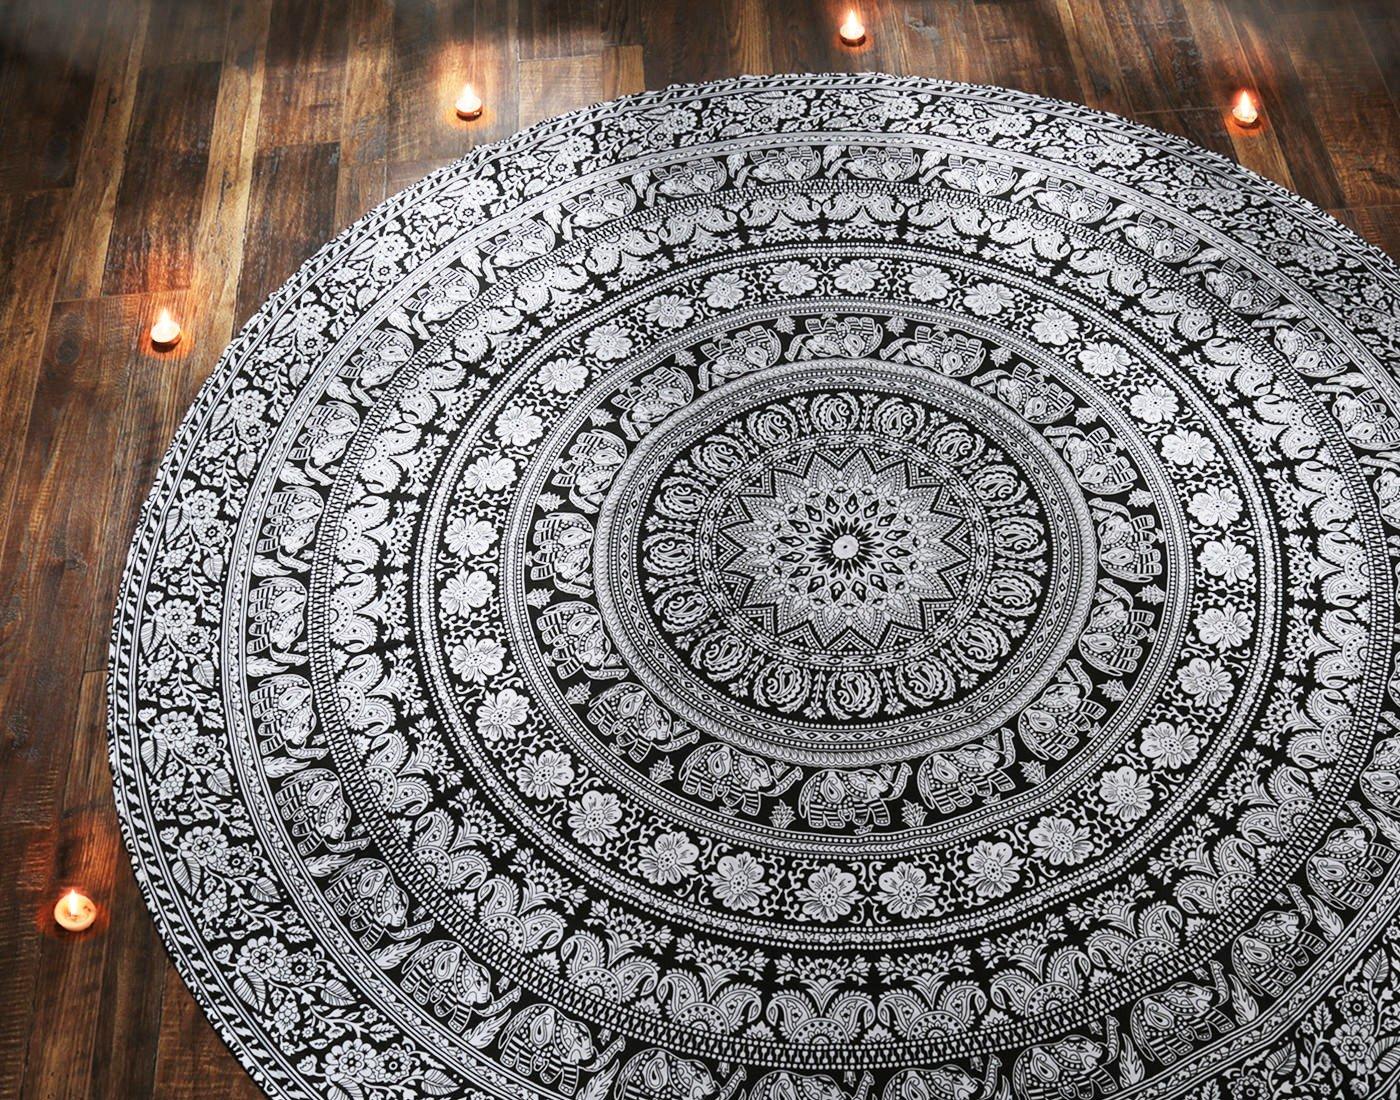 RAJRANG Black and White Elephant Round Tapestry Mandala Roundie Beach Throw Indian Hippie Meditation Yoga Room Decor